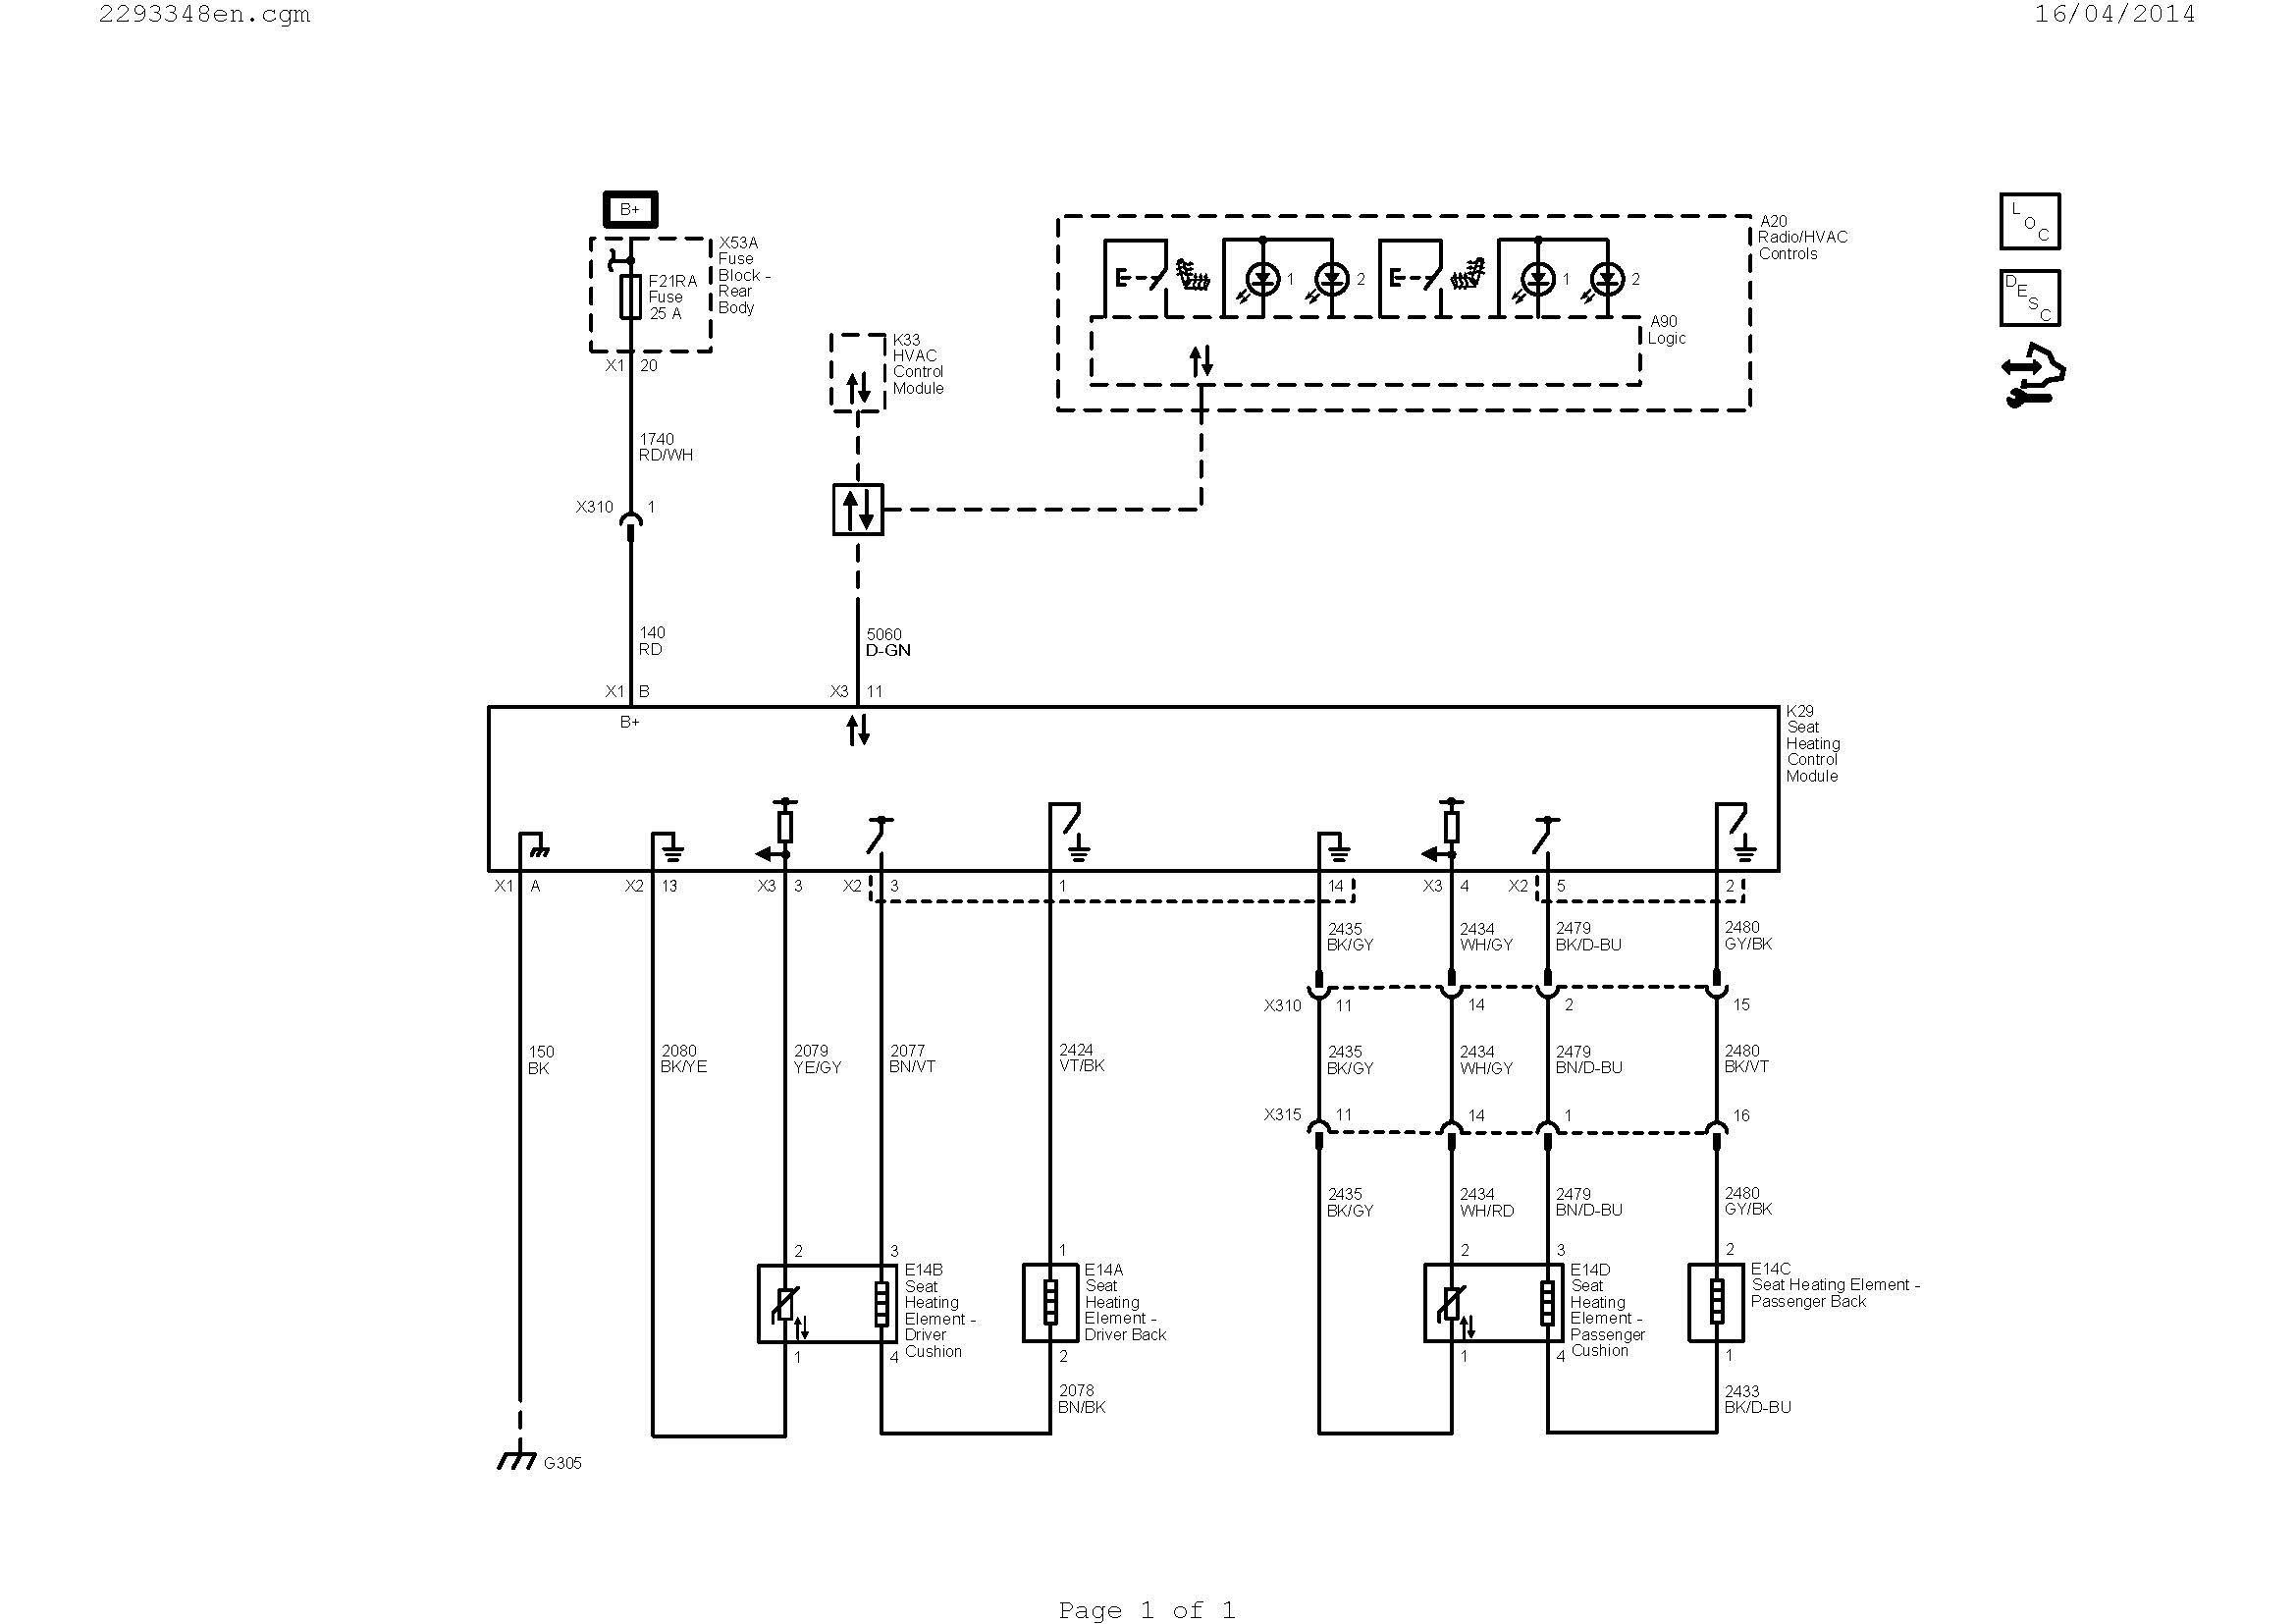 Evaporative Cooler Switch Wiring Diagram | Wiring Diagram - Swamp Cooler Wiring Diagram